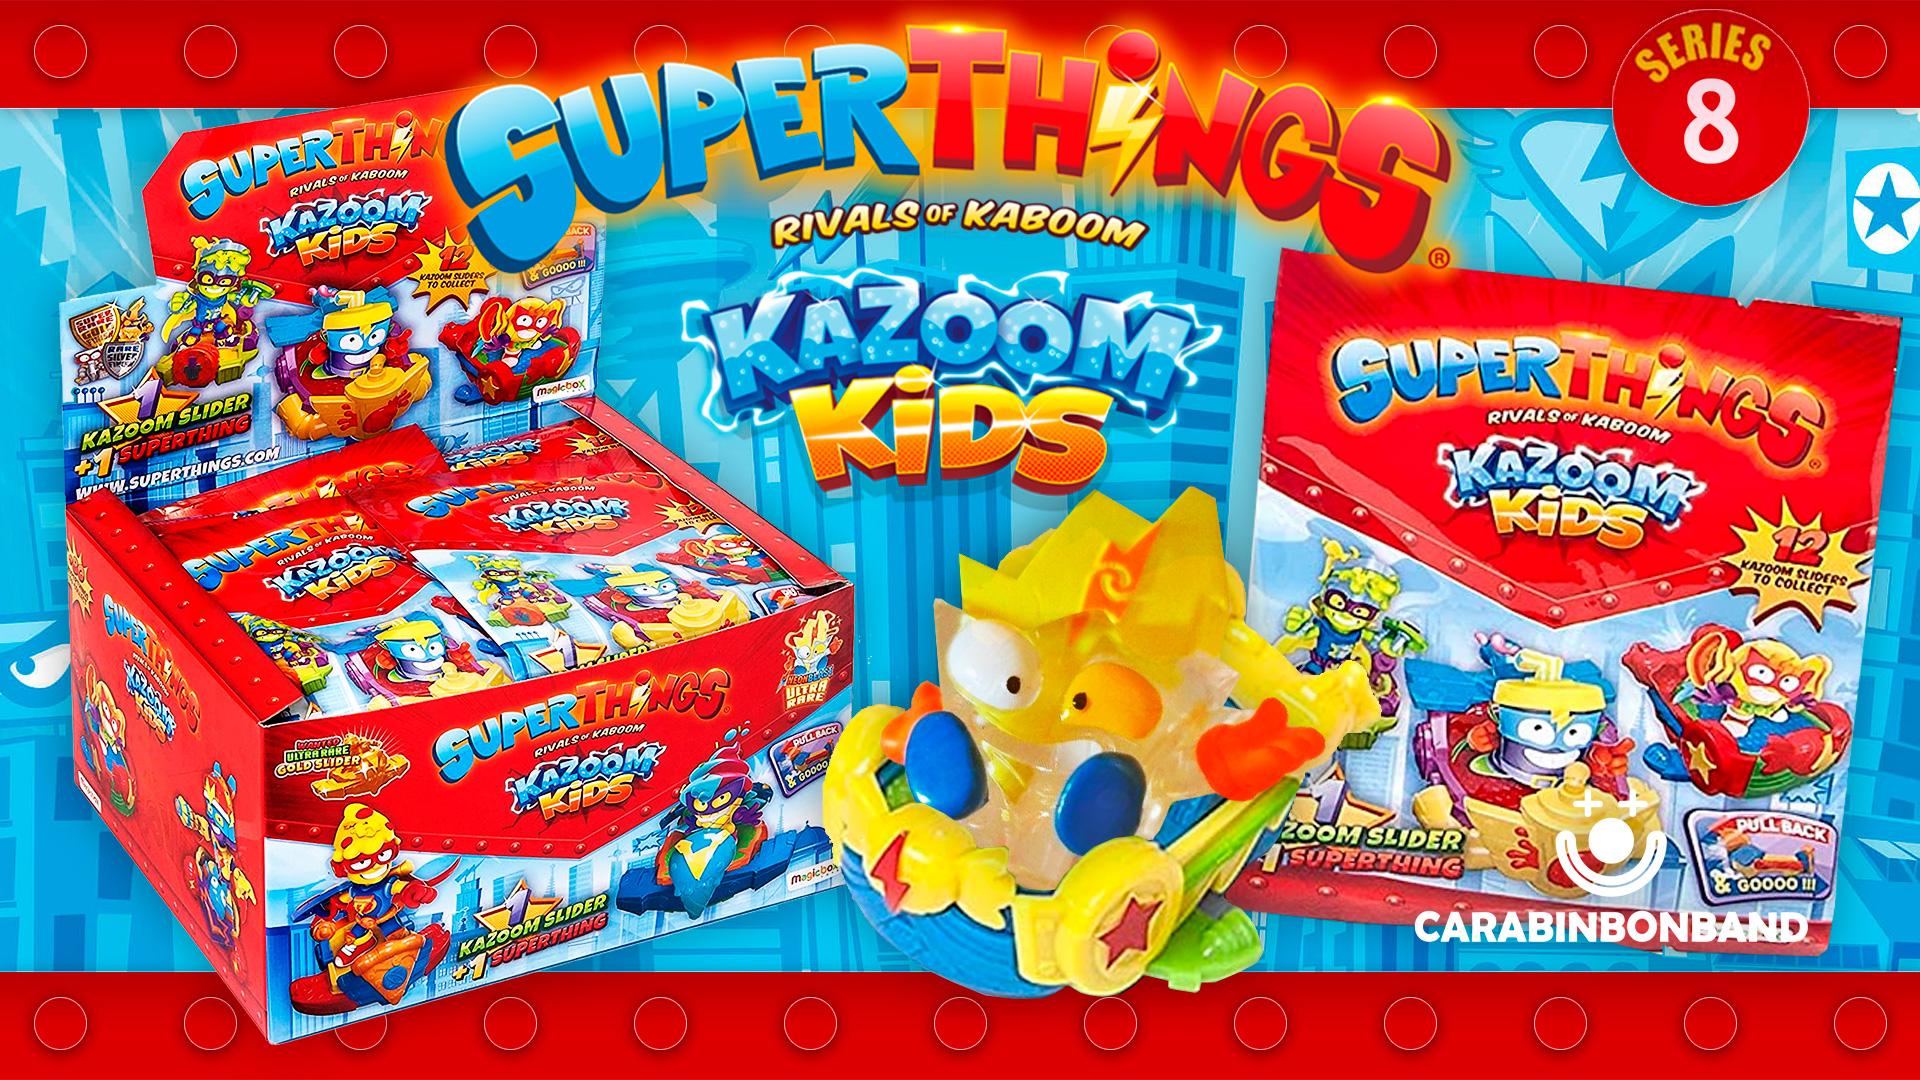 SUPERTHINGS 8 - UNBOXING COMPLETE BOX OF SLIDERS - SUPERZINGS KAZOOM KIDS